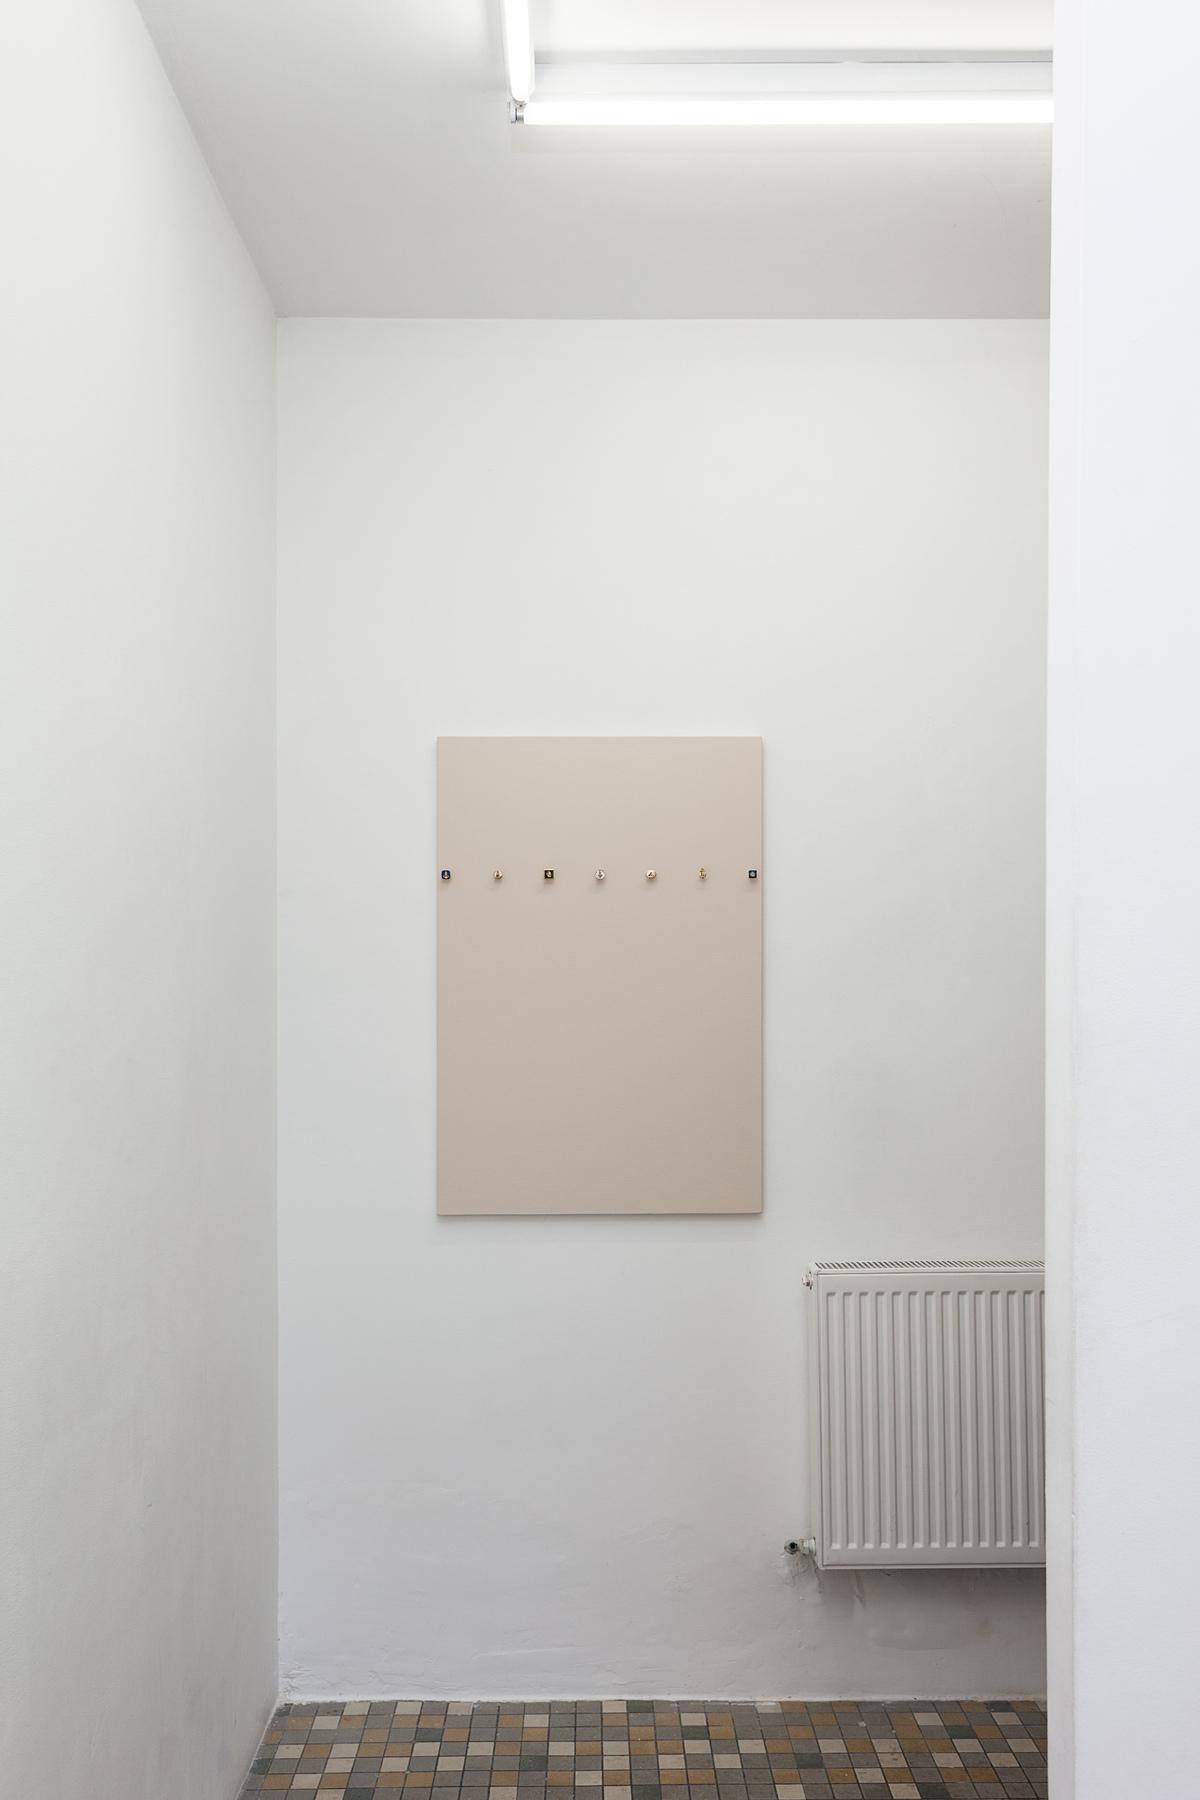 Shanaynay-JulienM-11